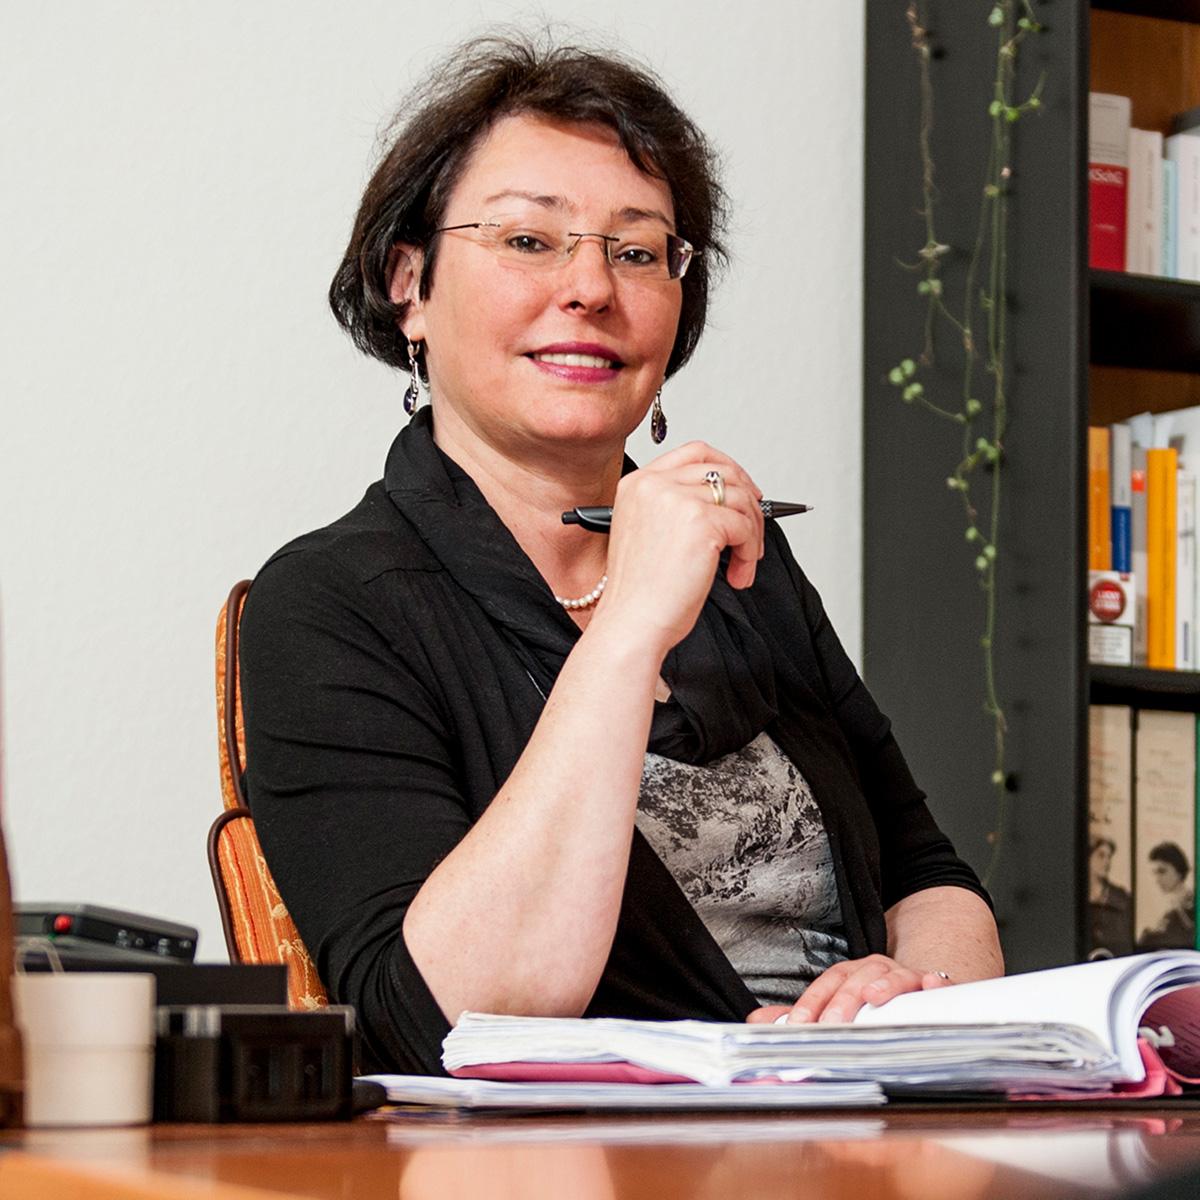 Dr. Agnes Strehlau-Weise